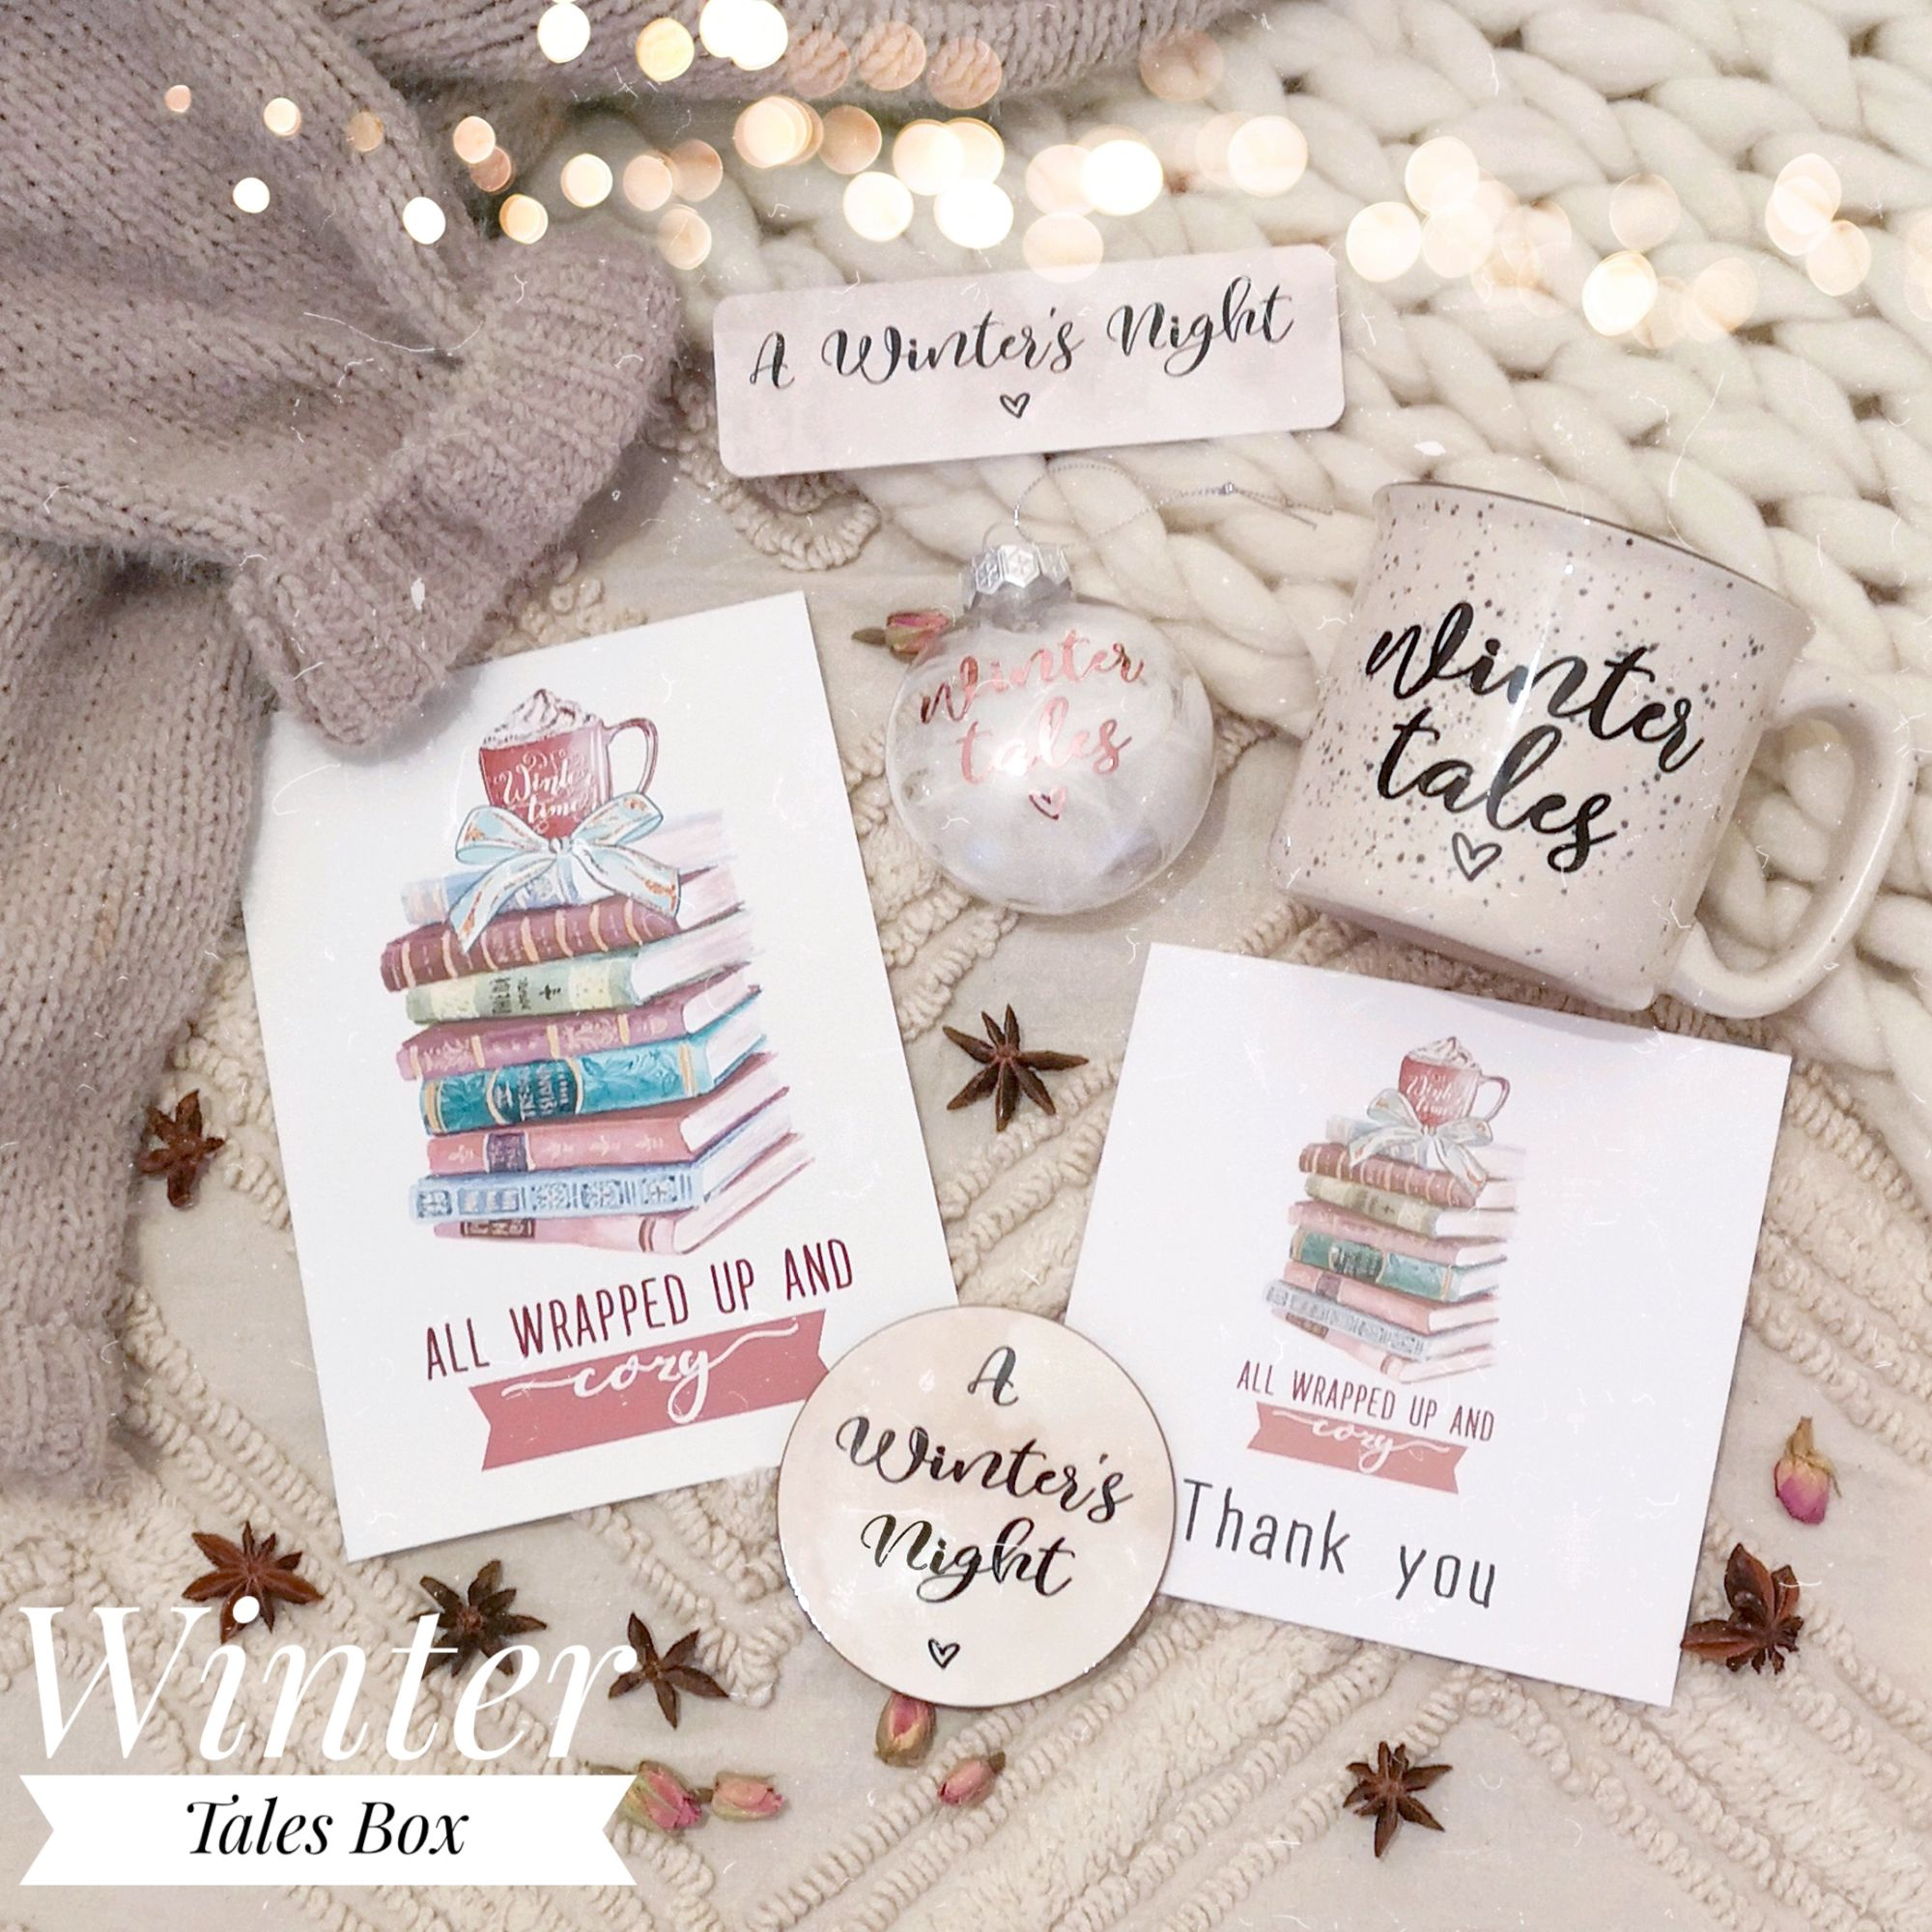 Bookish Winter Tales Box